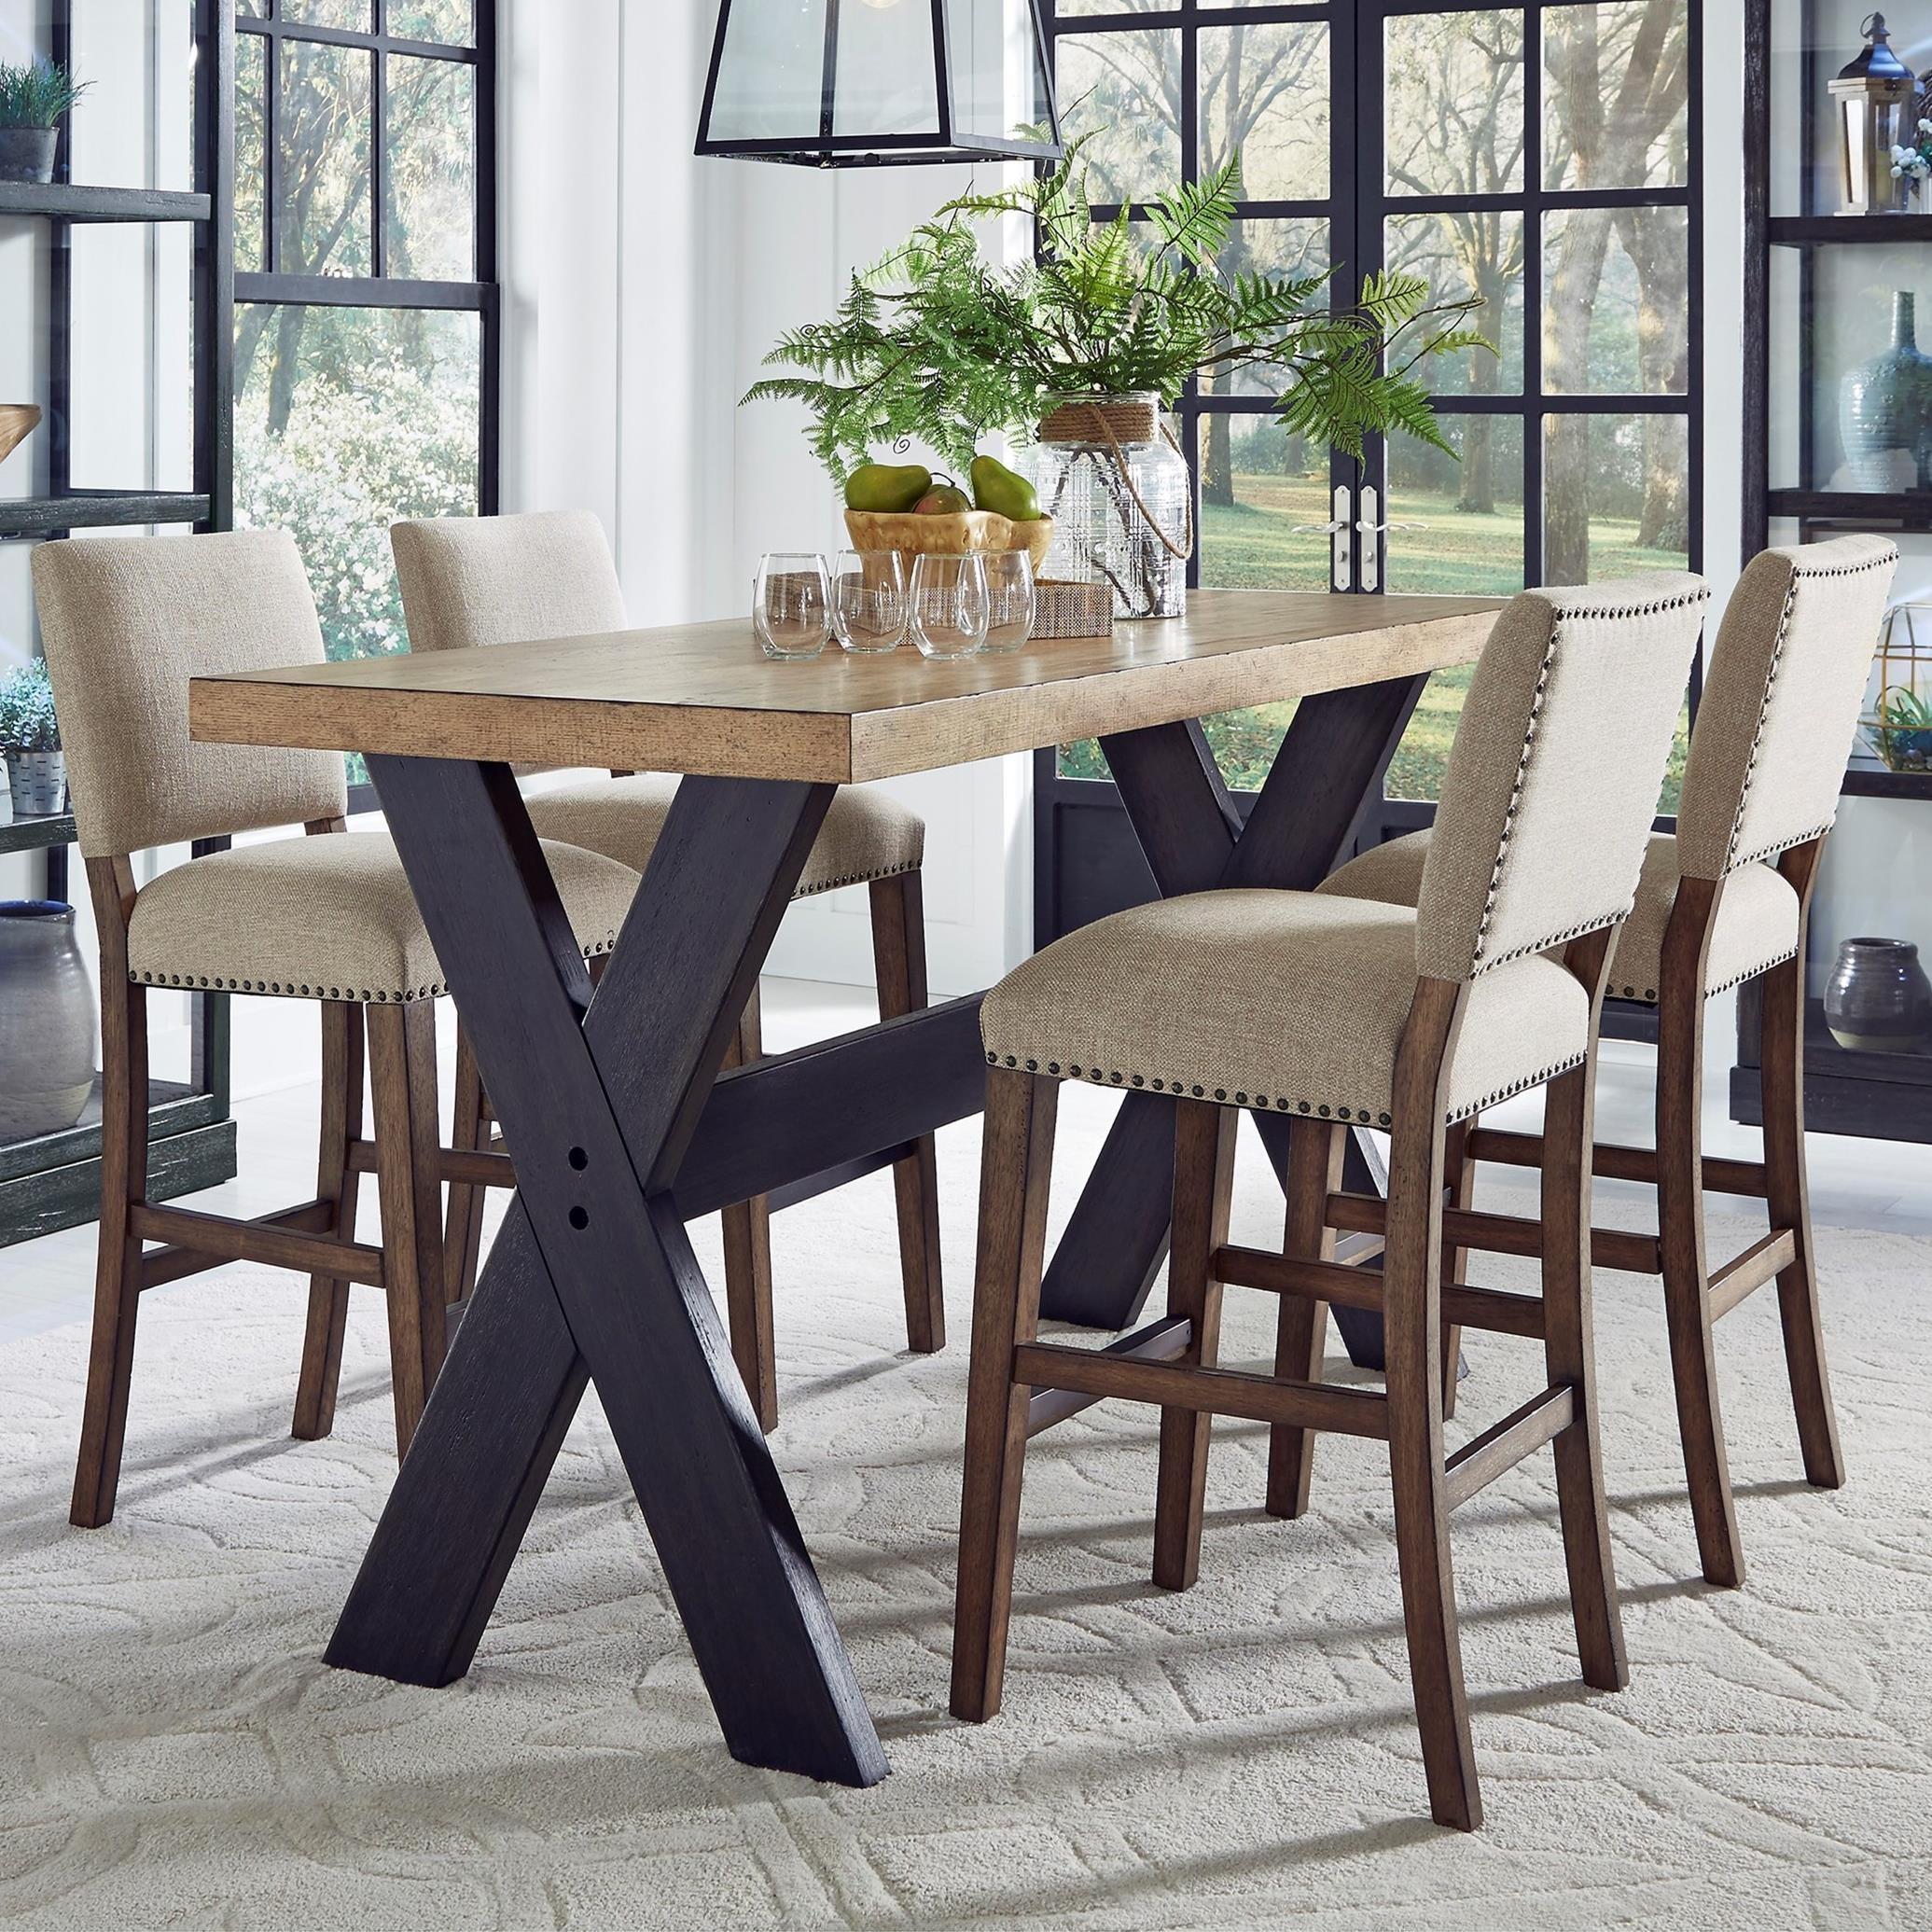 5-Piece Bar Table and Stool Set